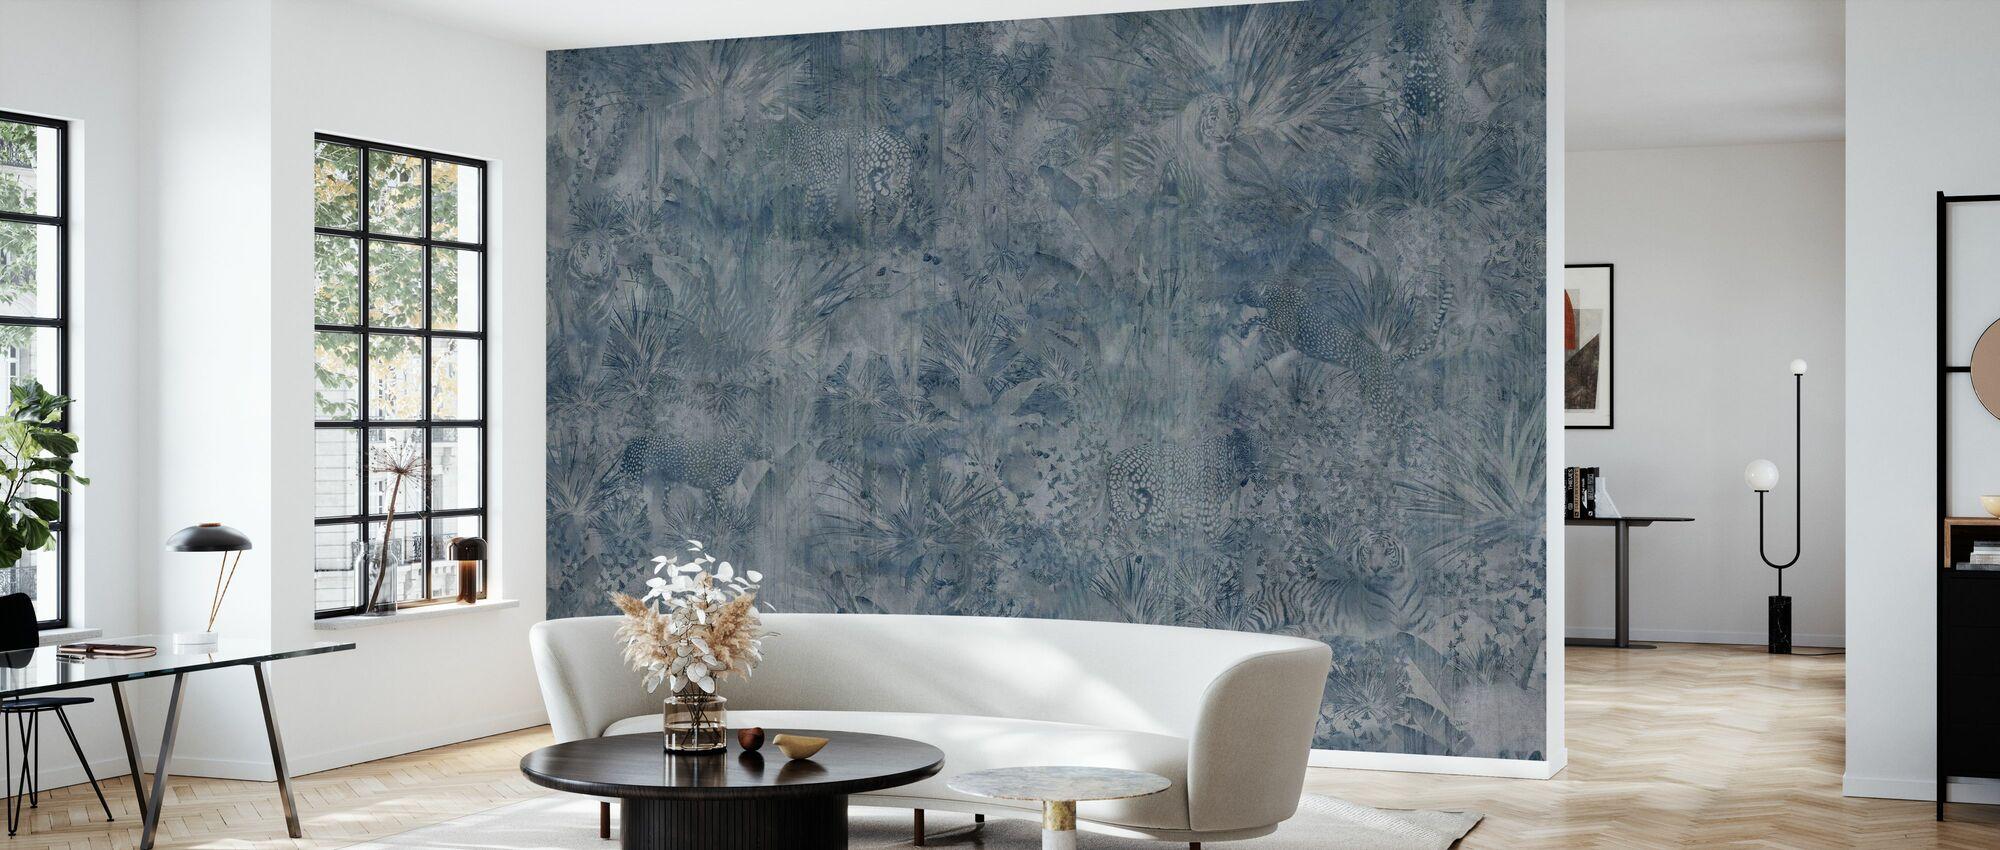 Tropical Panther - Indigo Ash - Wallpaper - Living Room